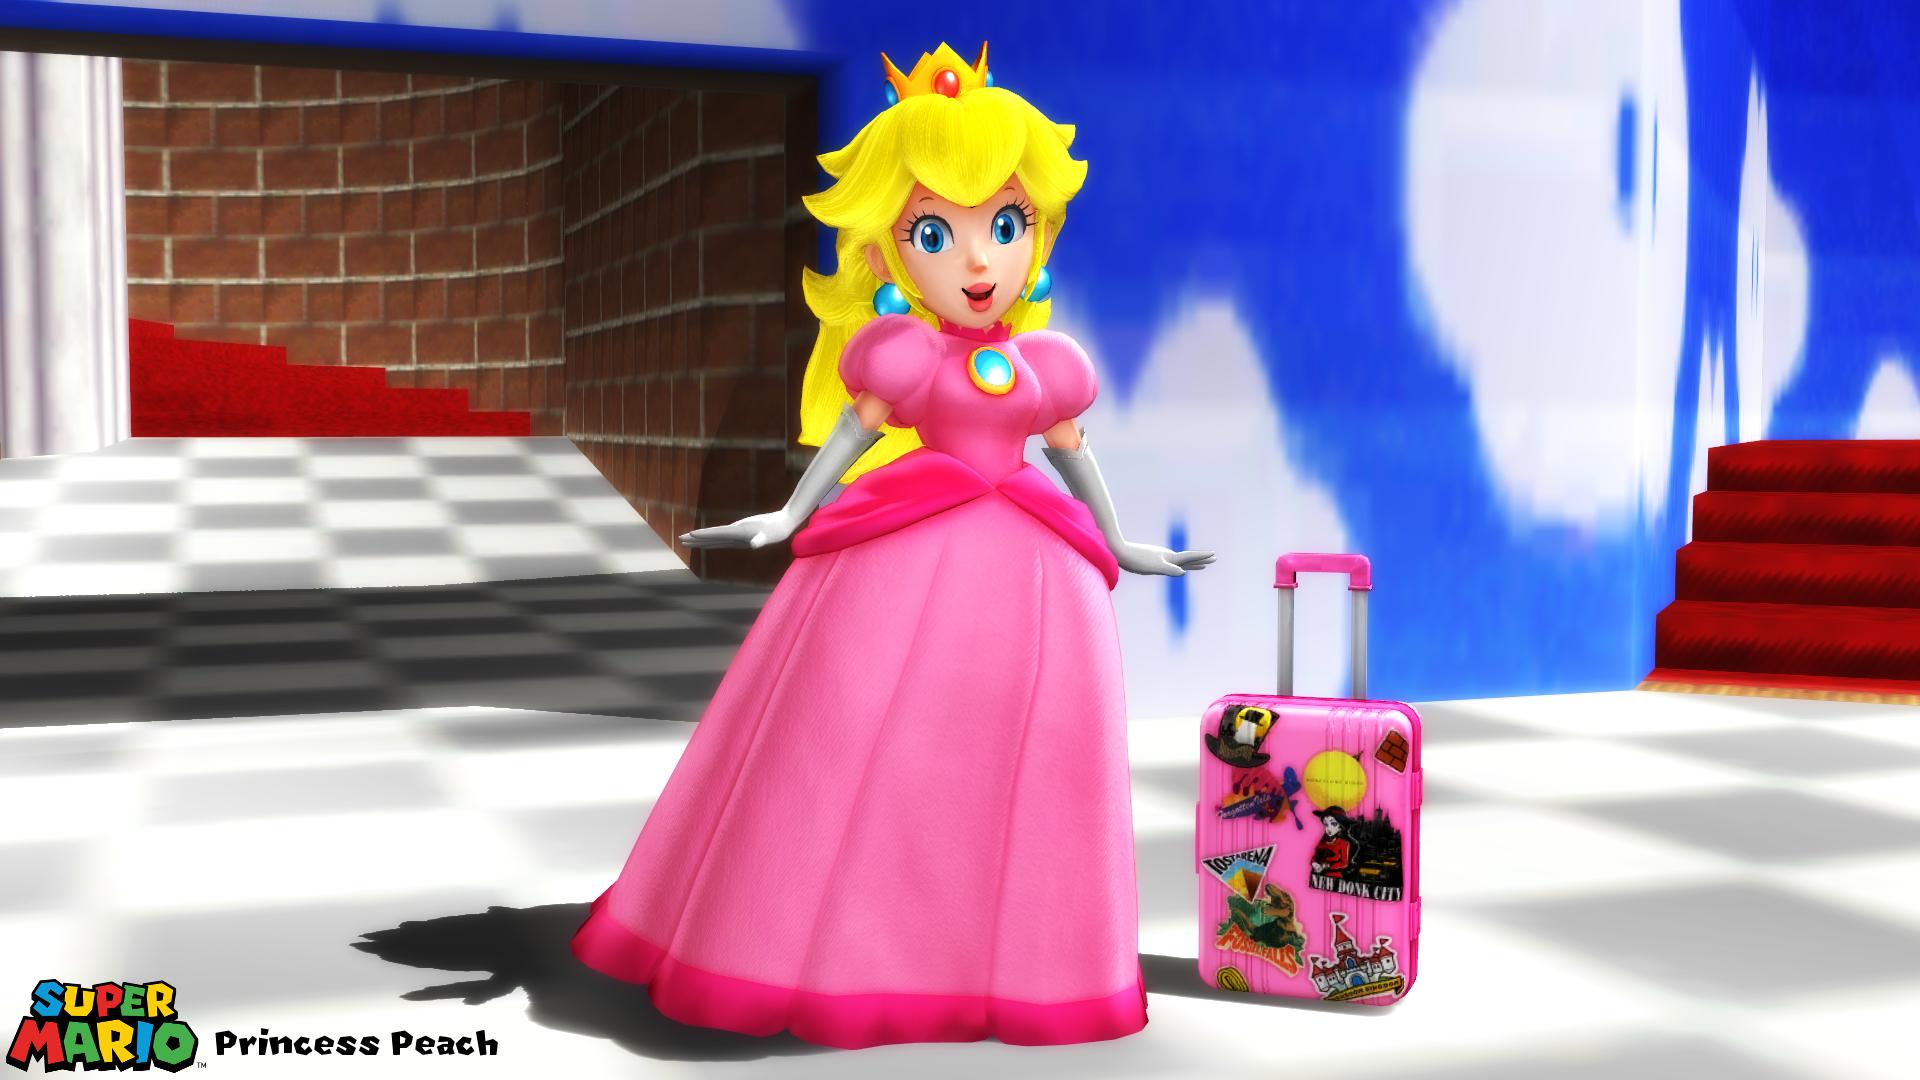 Mmd Model Princess Peach Odyssey Download By Sab64 On